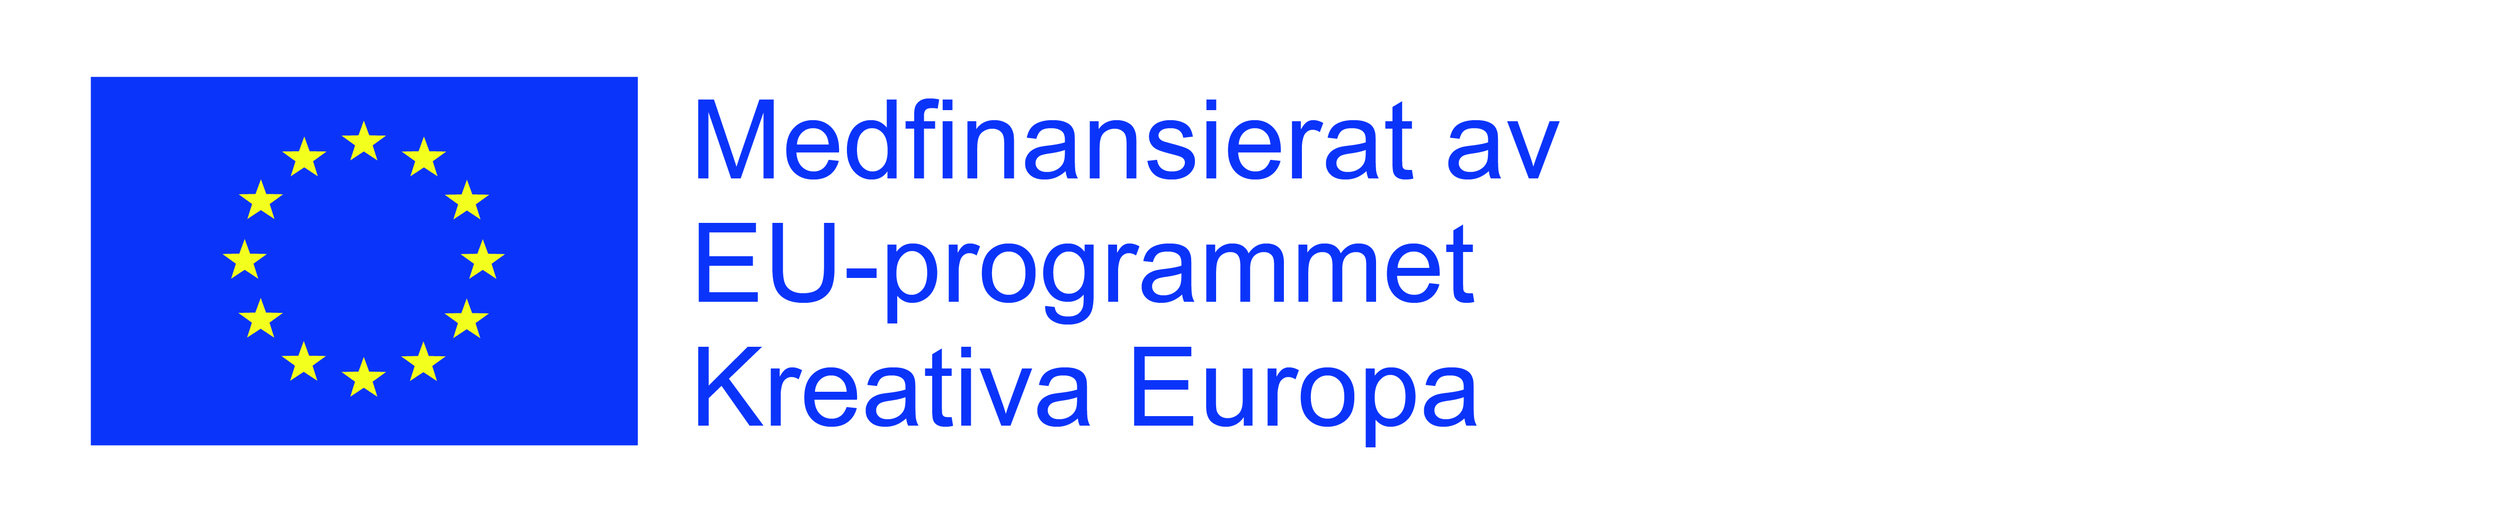 LogosBeneficairesCreativeEuropeRIGHT_SV.jpg